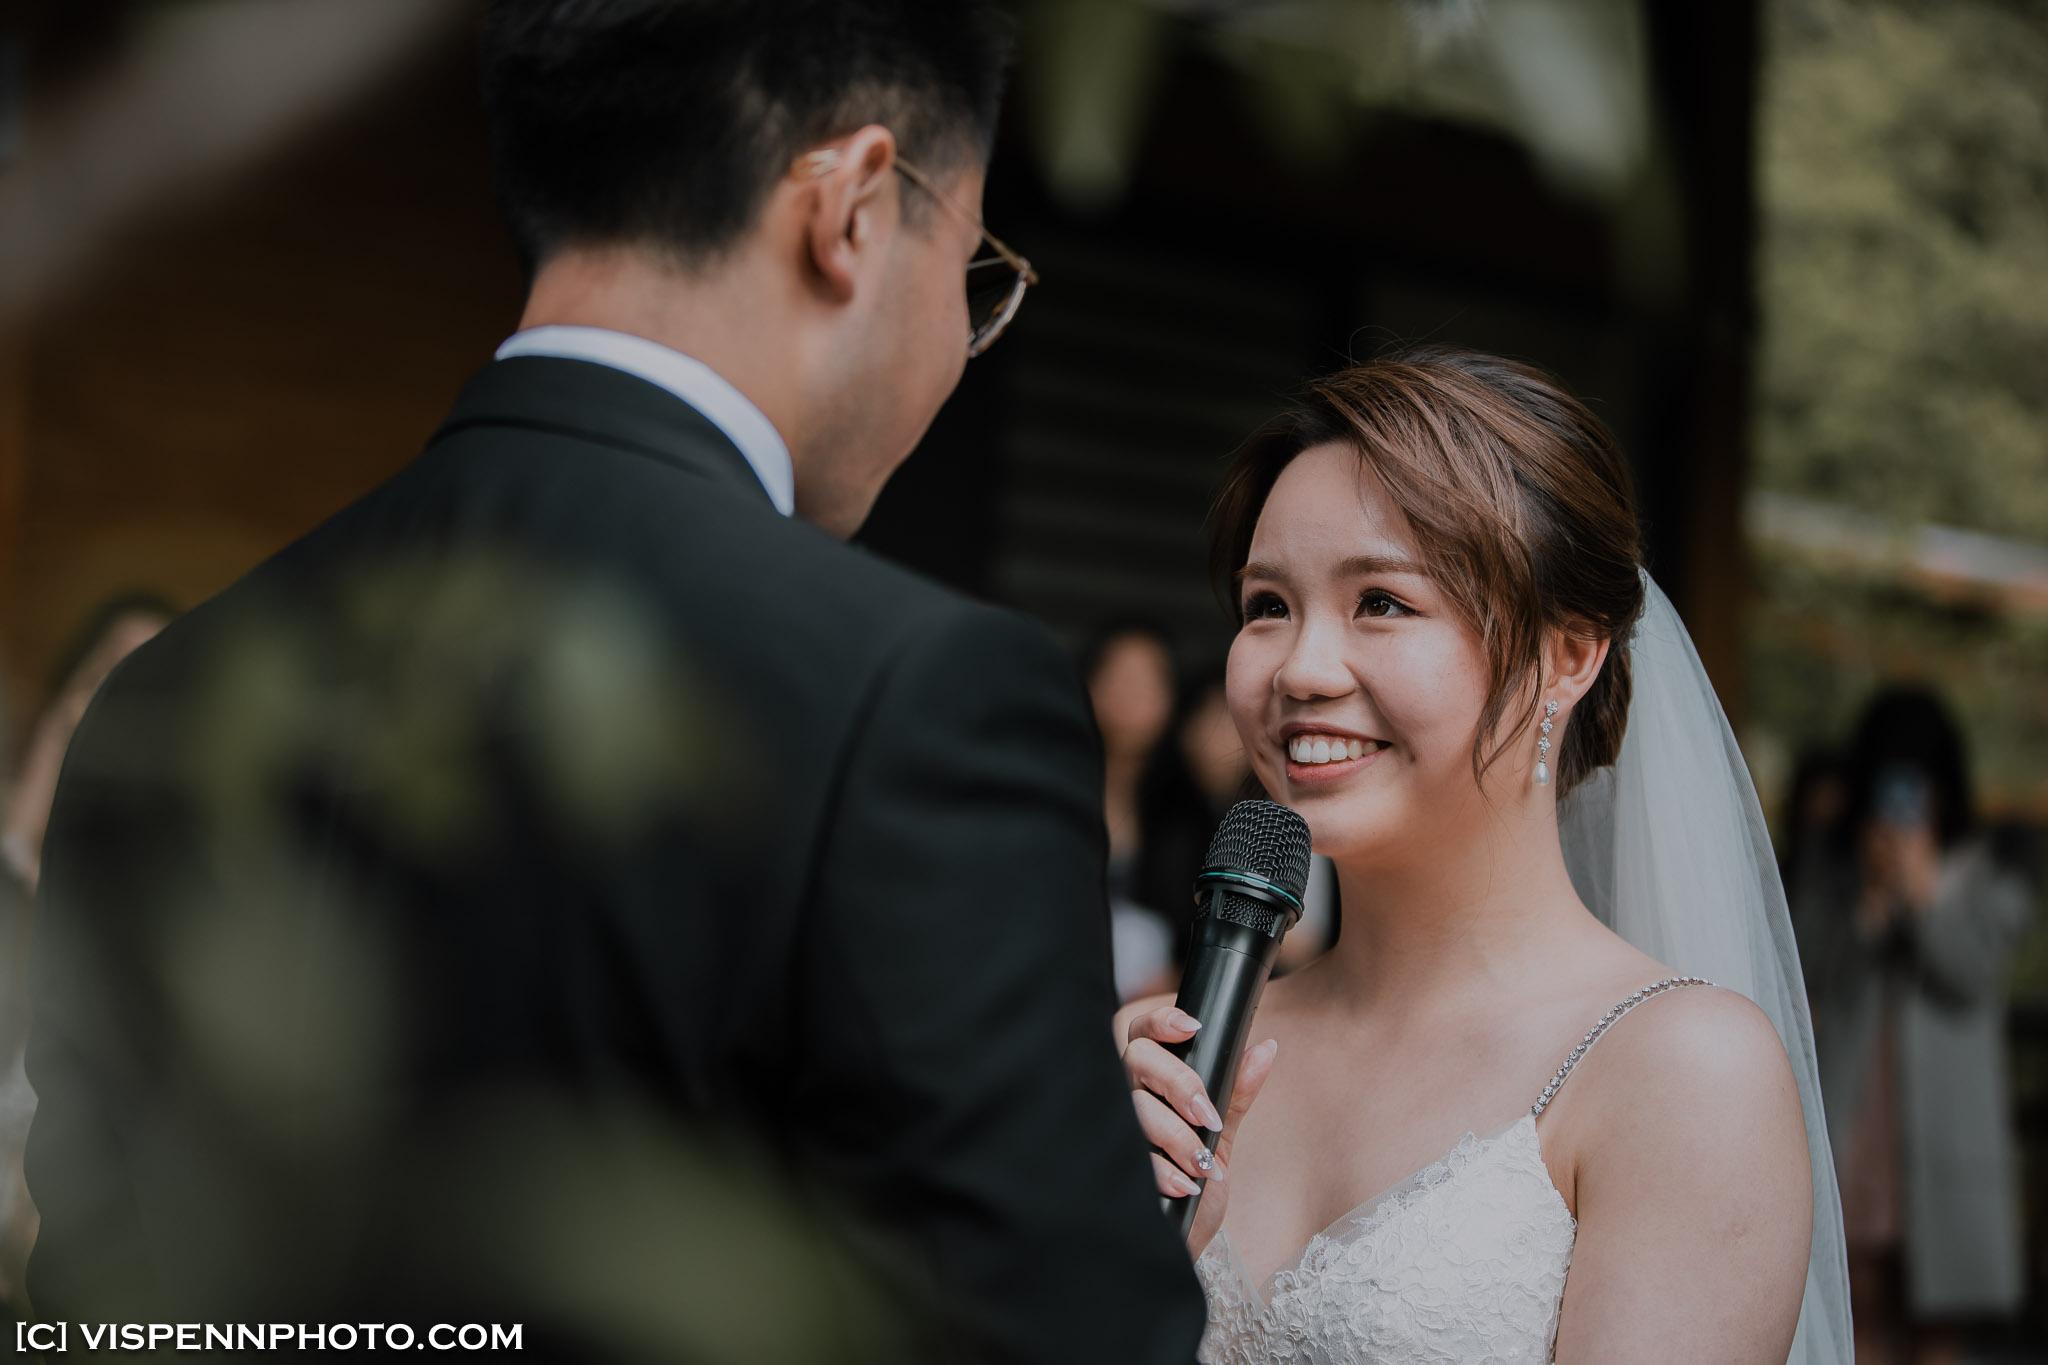 WEDDING DAY Photography Melbourne ElitaPB 08191 1P EOSR ZHPENN